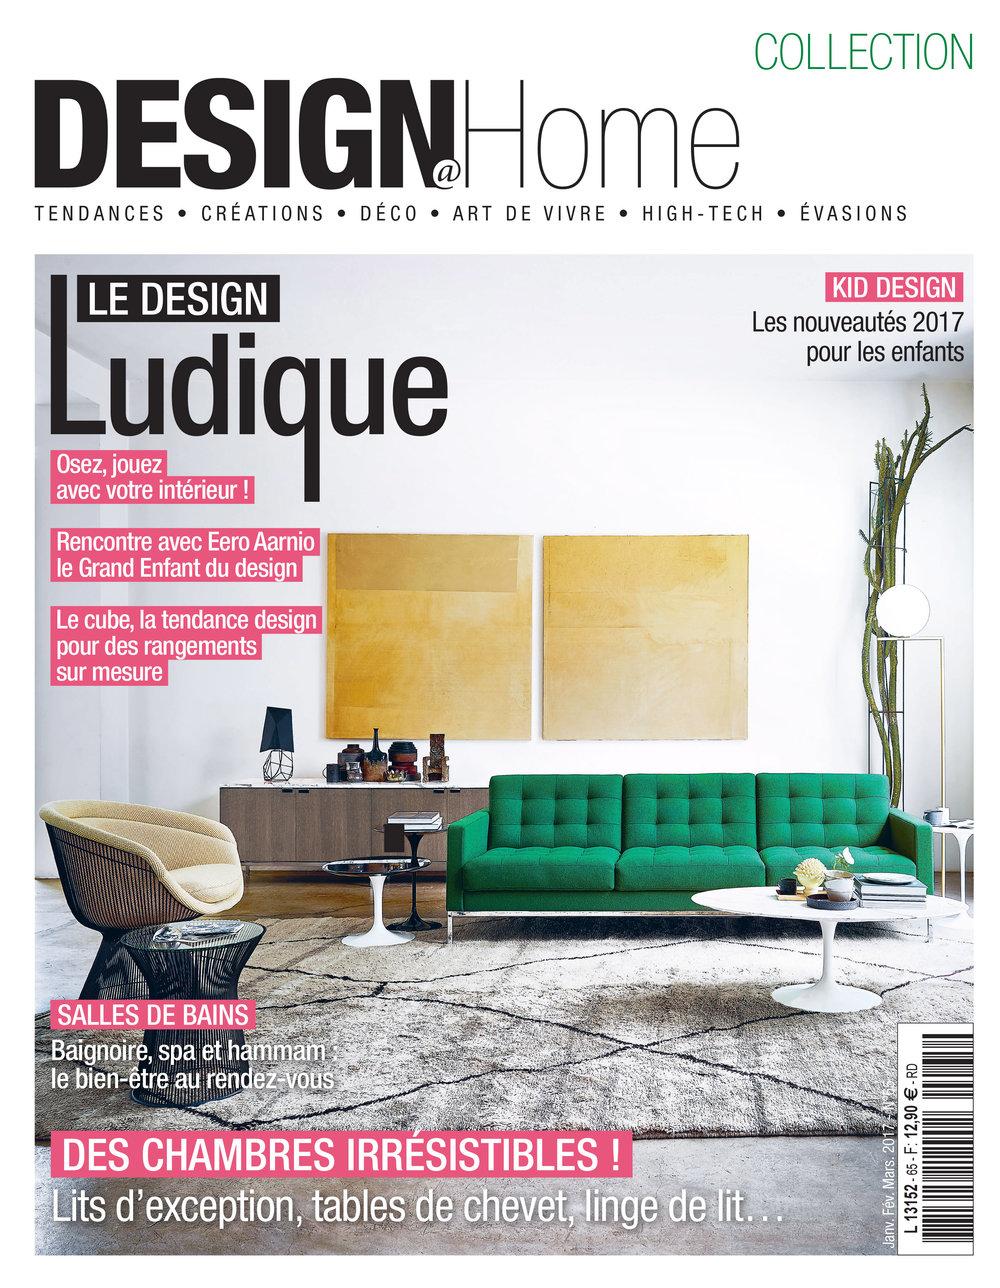 DESIGN@HOME 1/2017, FRANCE — Studio Finna